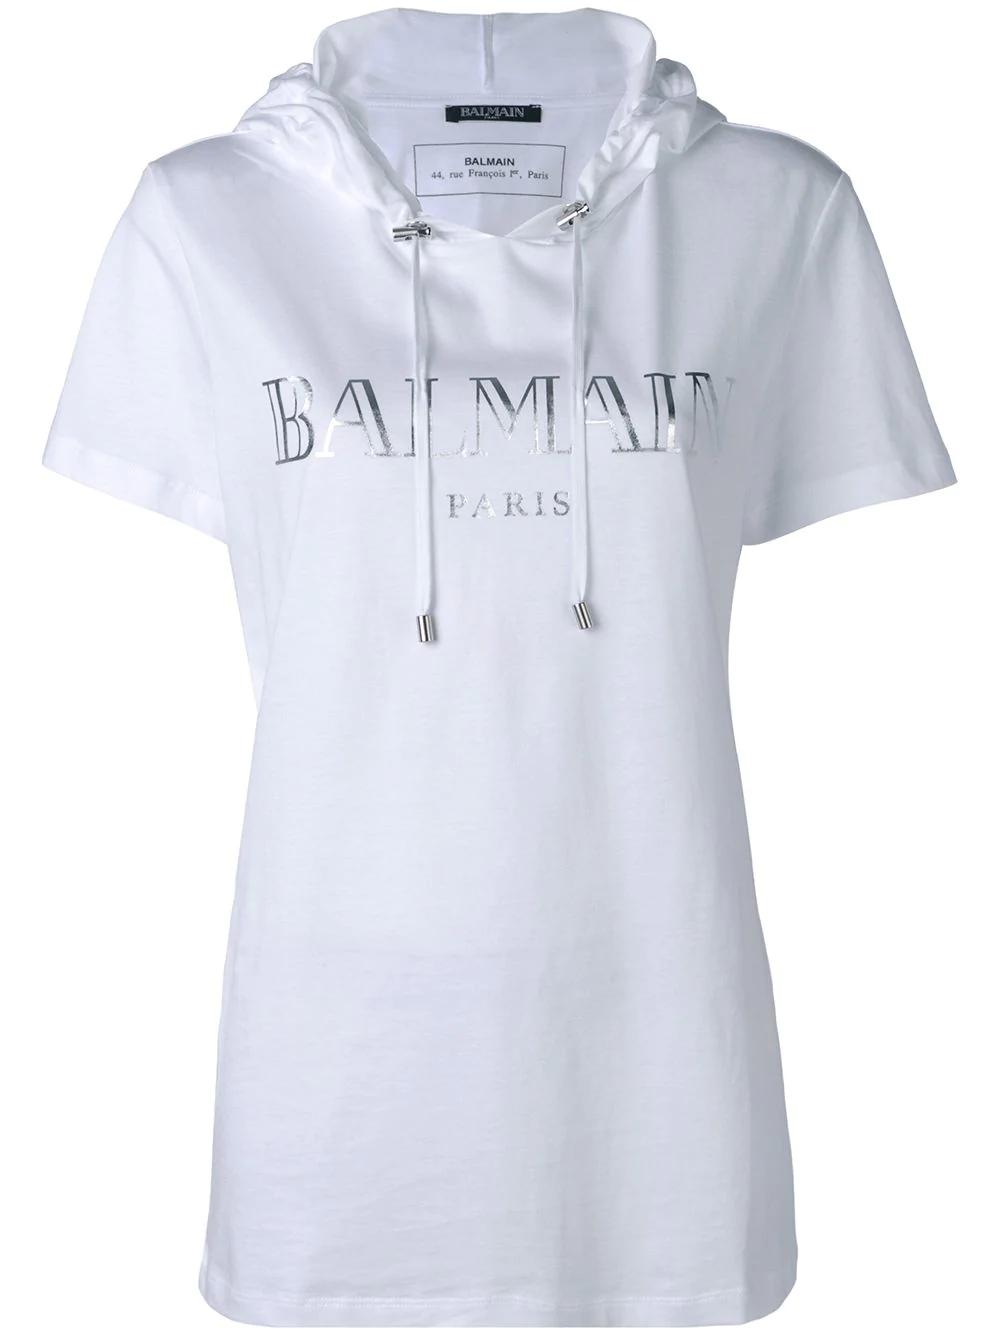 balmain t shirt mit kapuze wei in white modesens. Black Bedroom Furniture Sets. Home Design Ideas